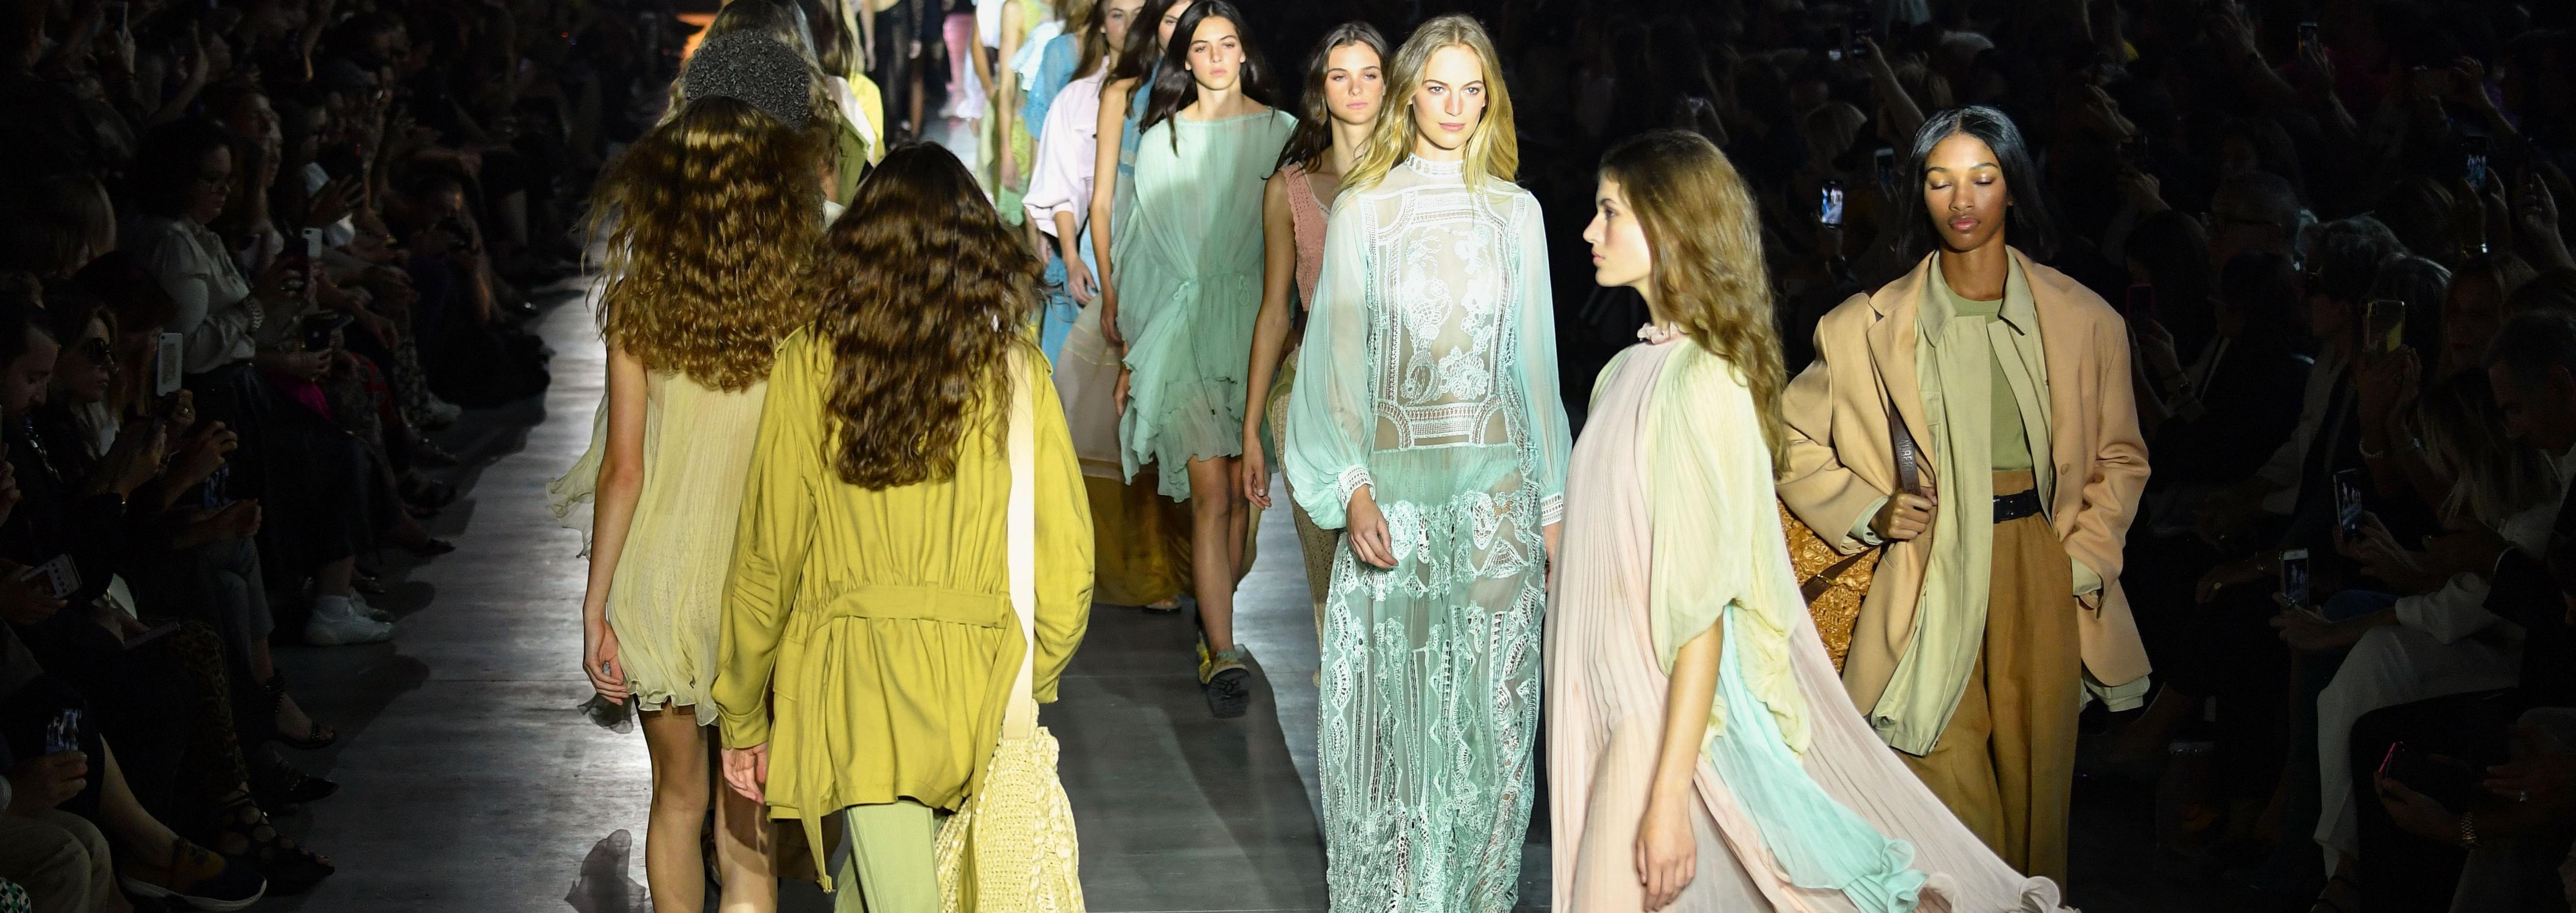 Milano Fashion Week Alberta Ferretti